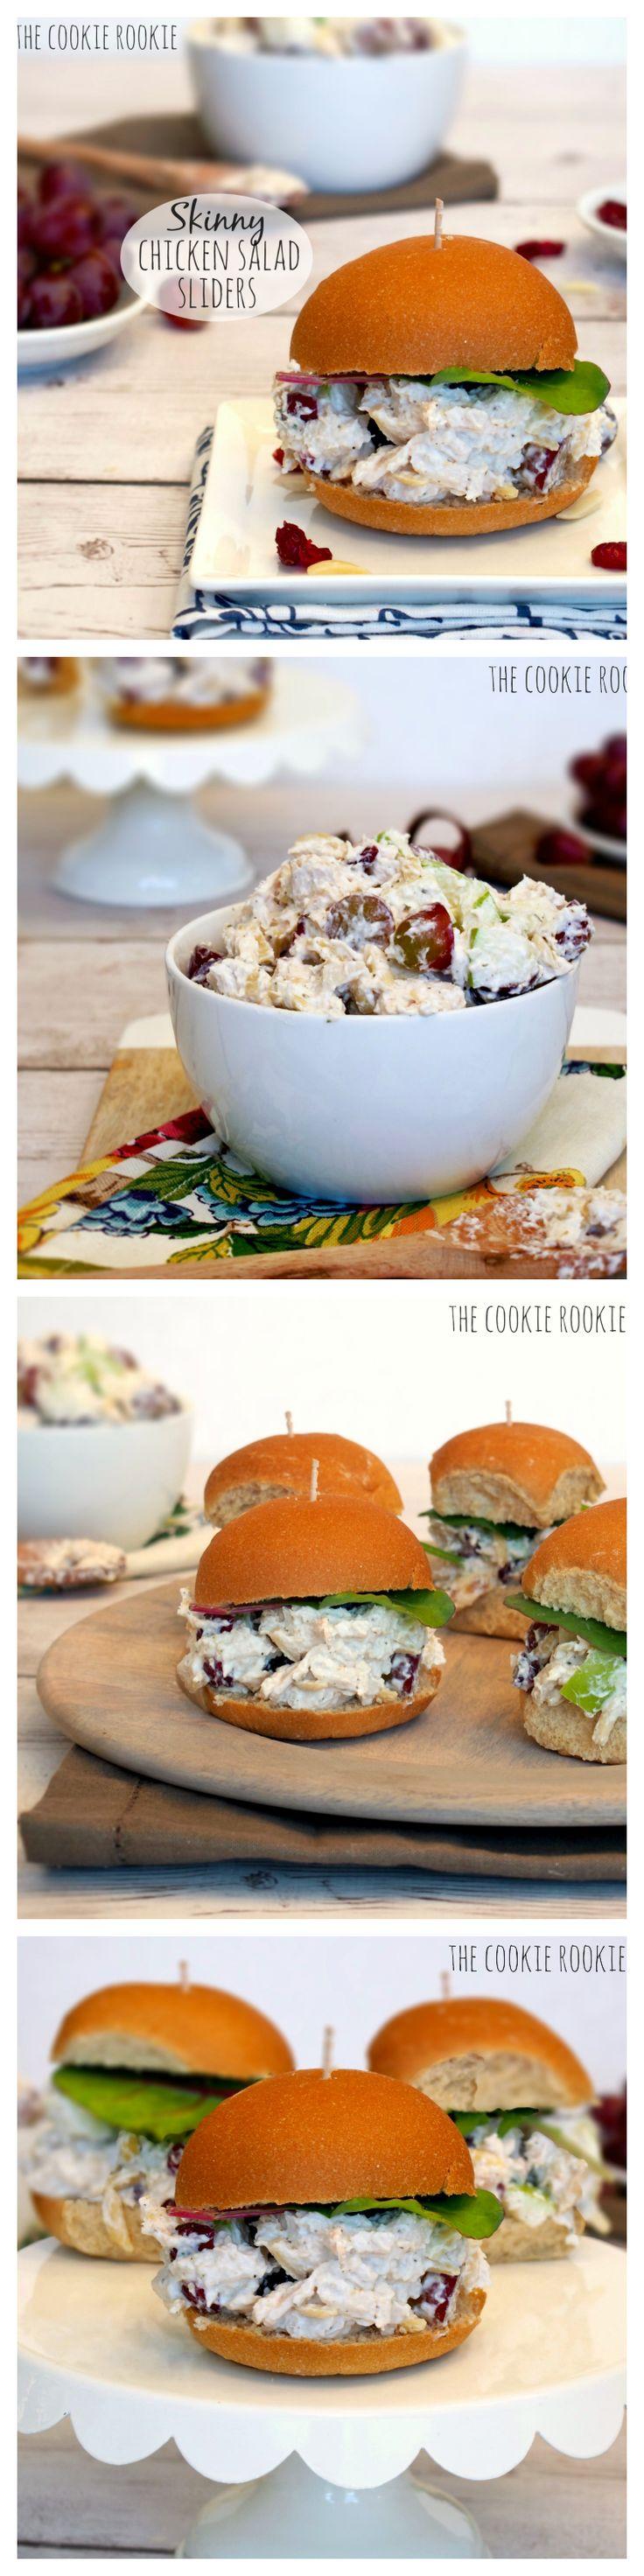 Skinny Chicken Salad Sliders made with Greek Yogurt.  Healthy Chicken Salad! YES!!! - The Cookie Rookie